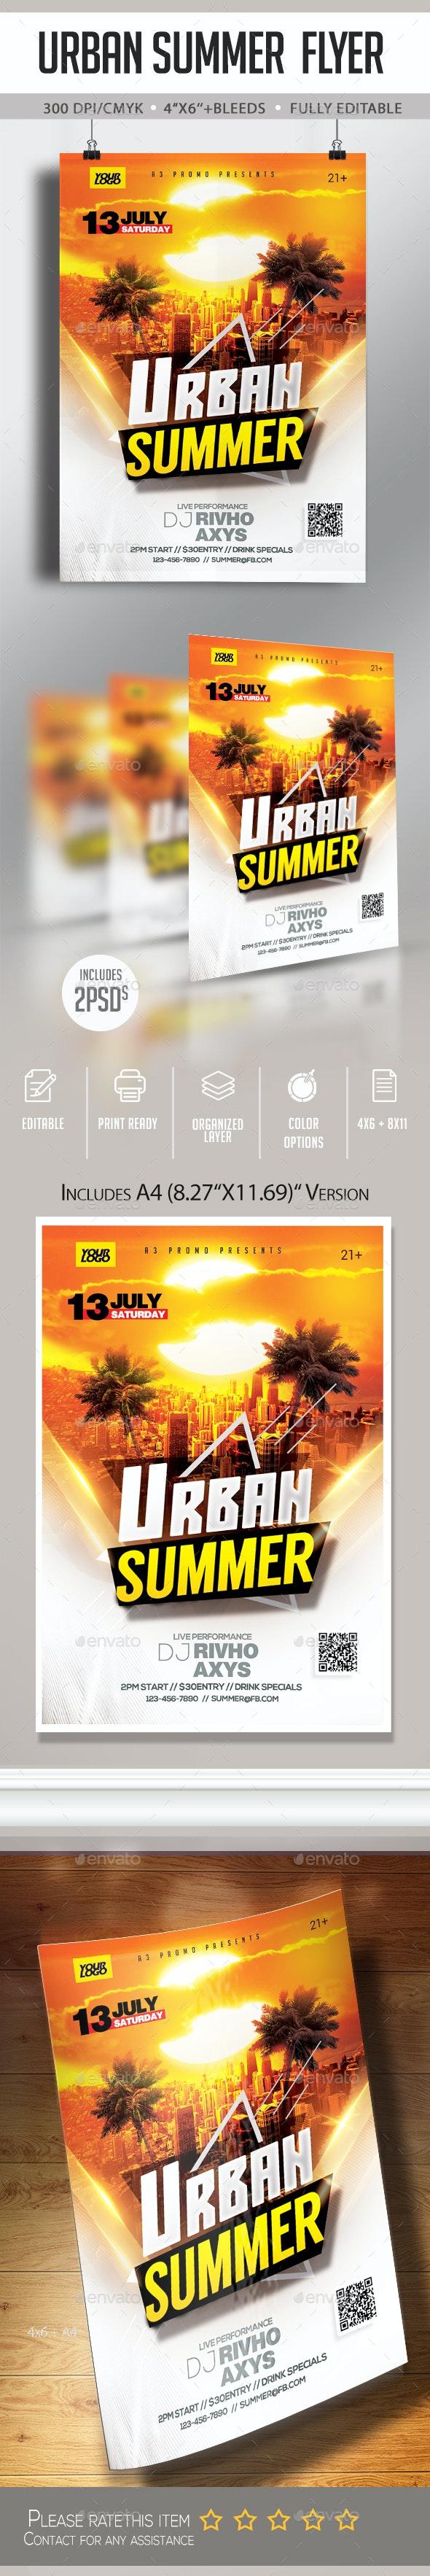 Urban Summer Flyer - Clubs & Parties Events